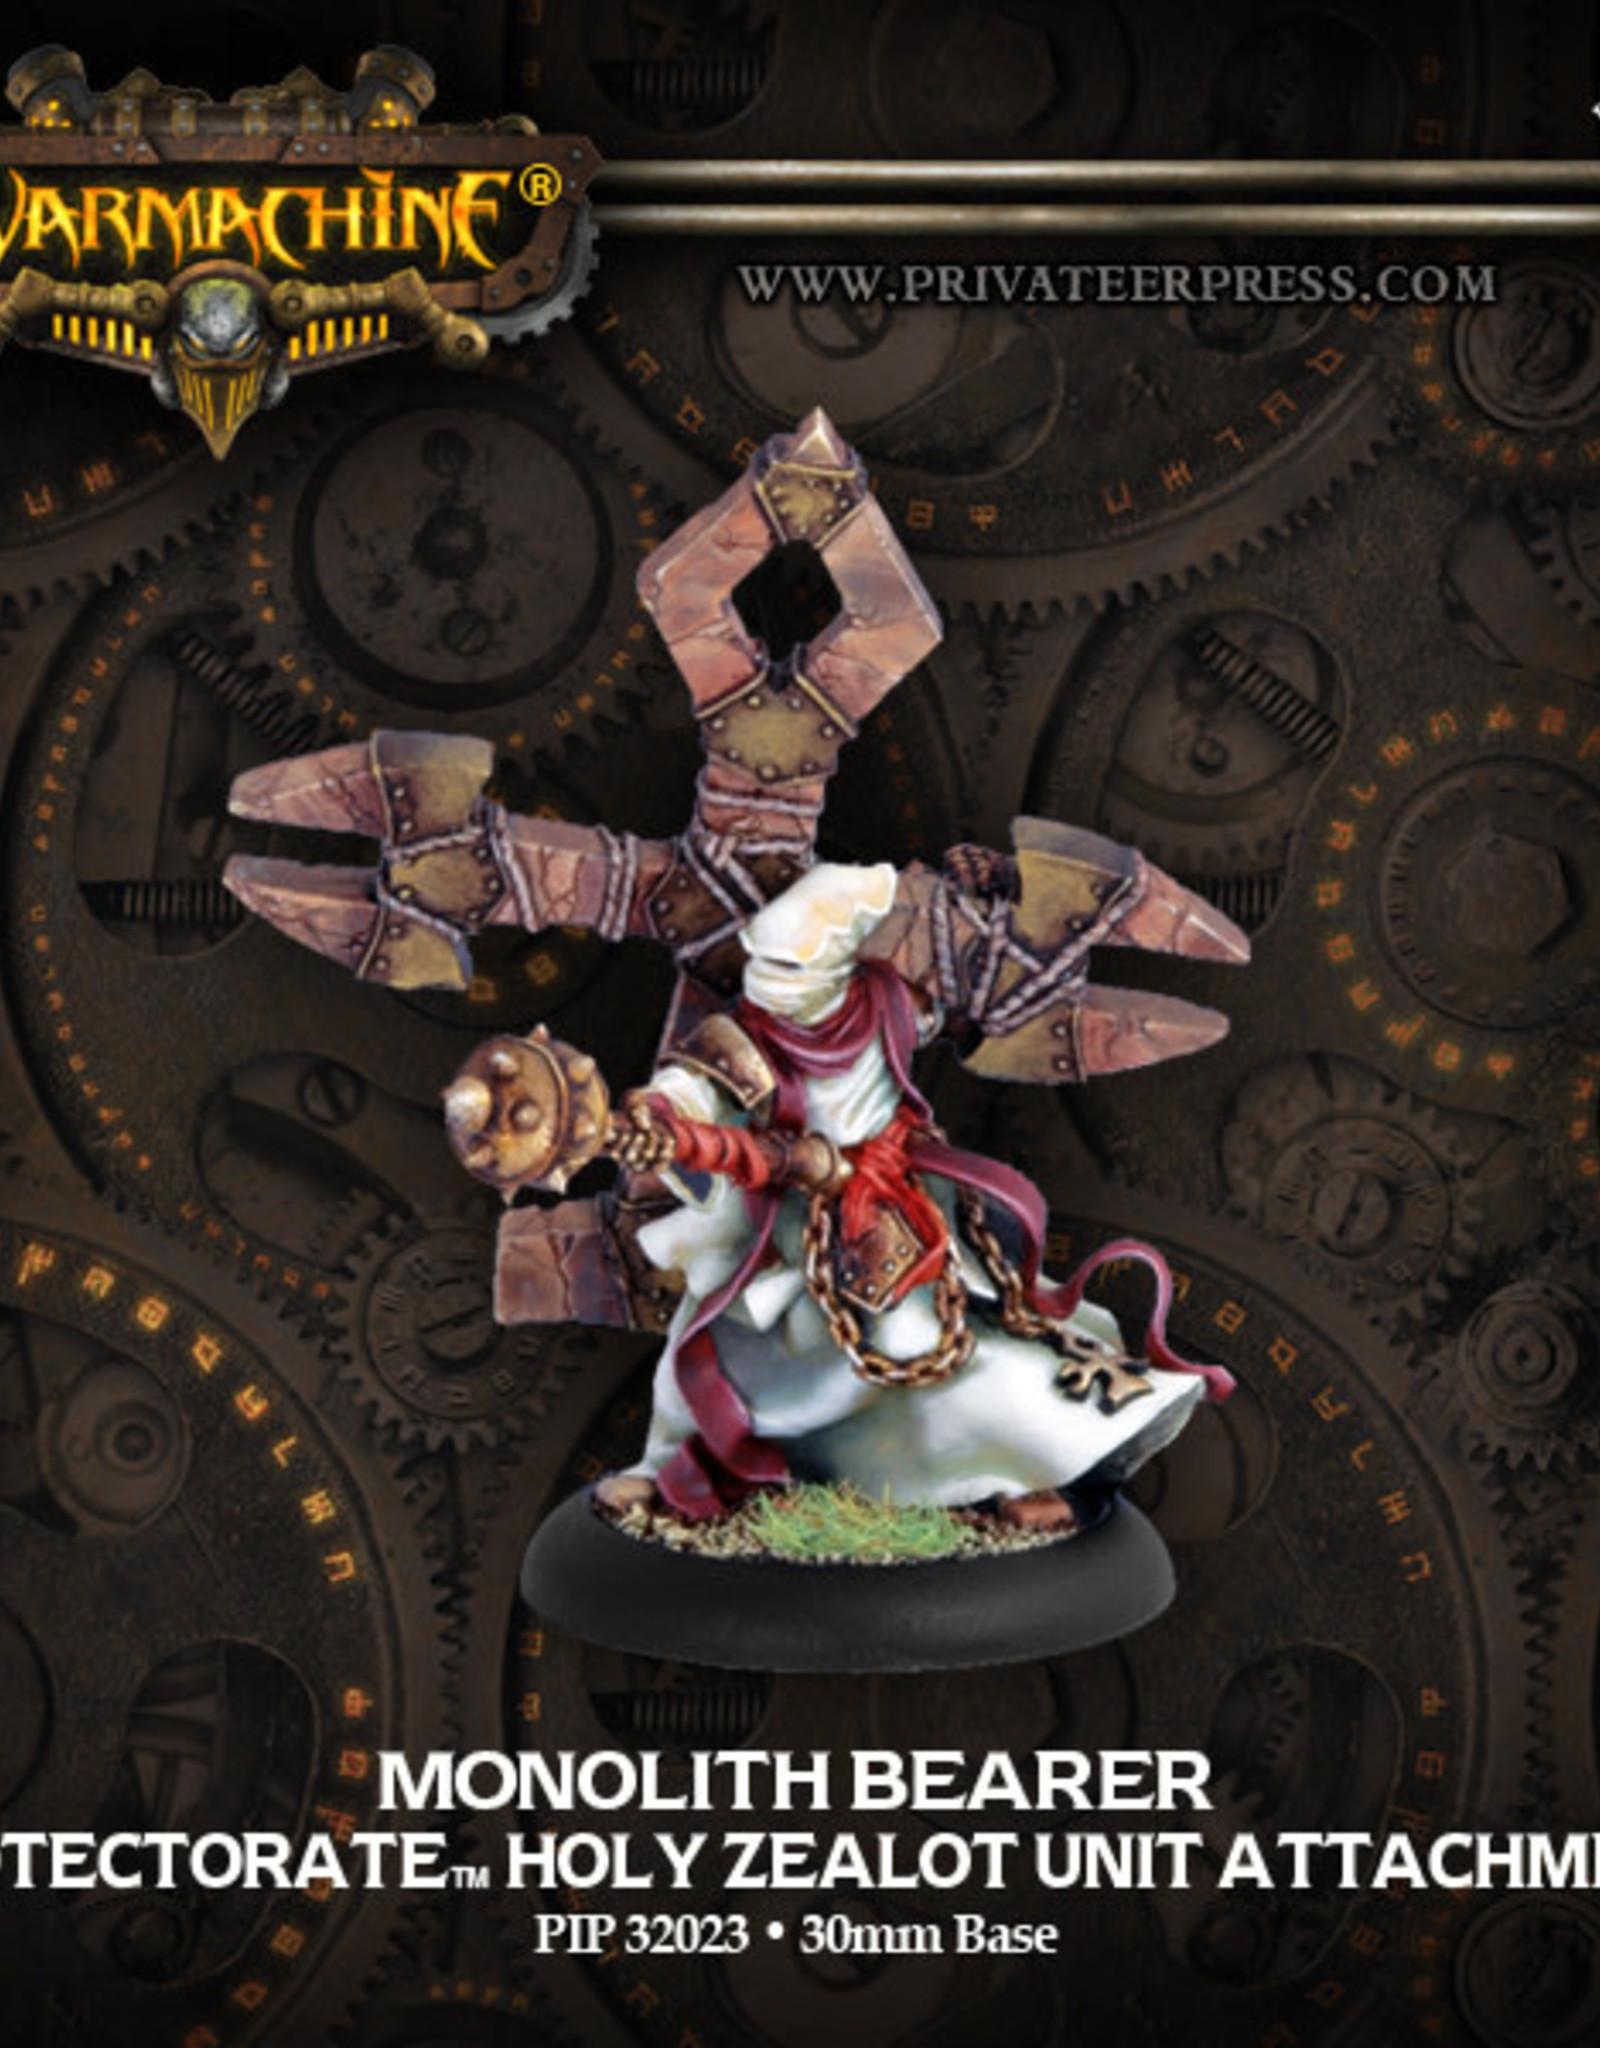 Warmachine Protectorate - Monolith Bearer